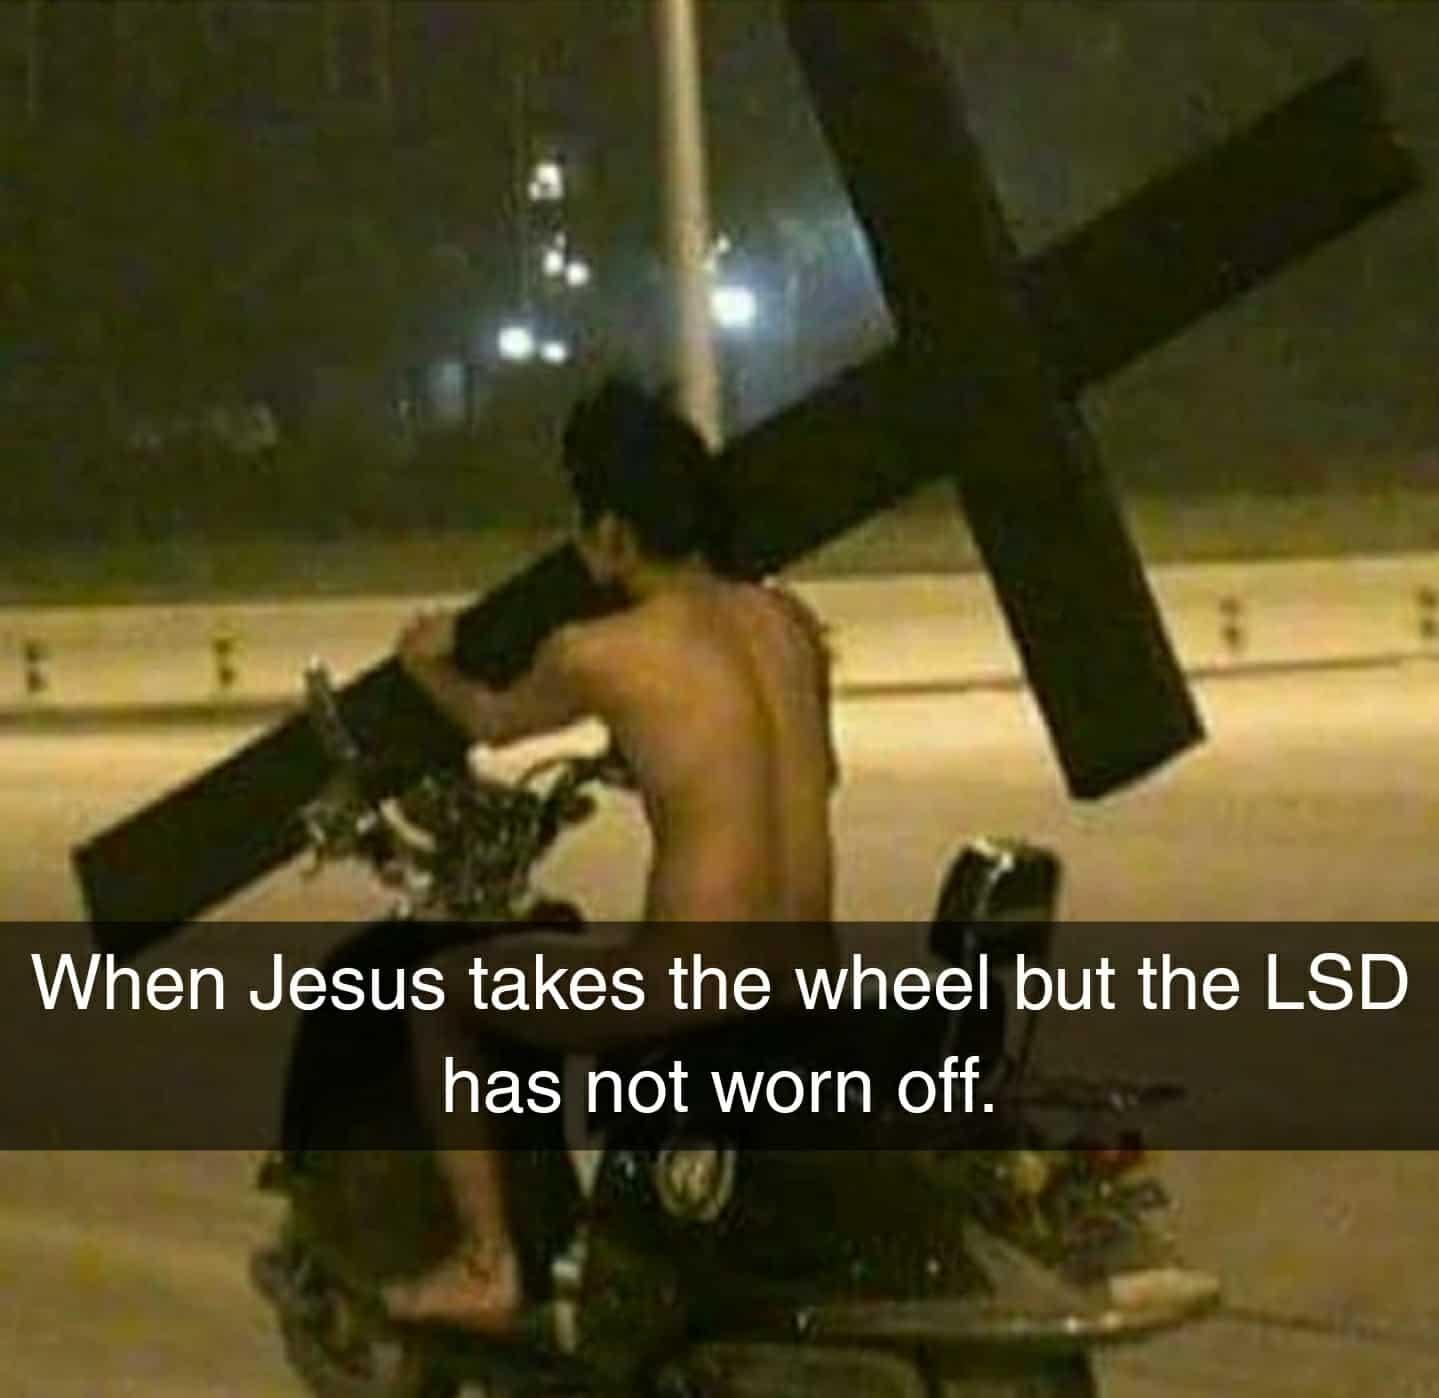 LSD hasn't worn off Jesus take the wheel Meme